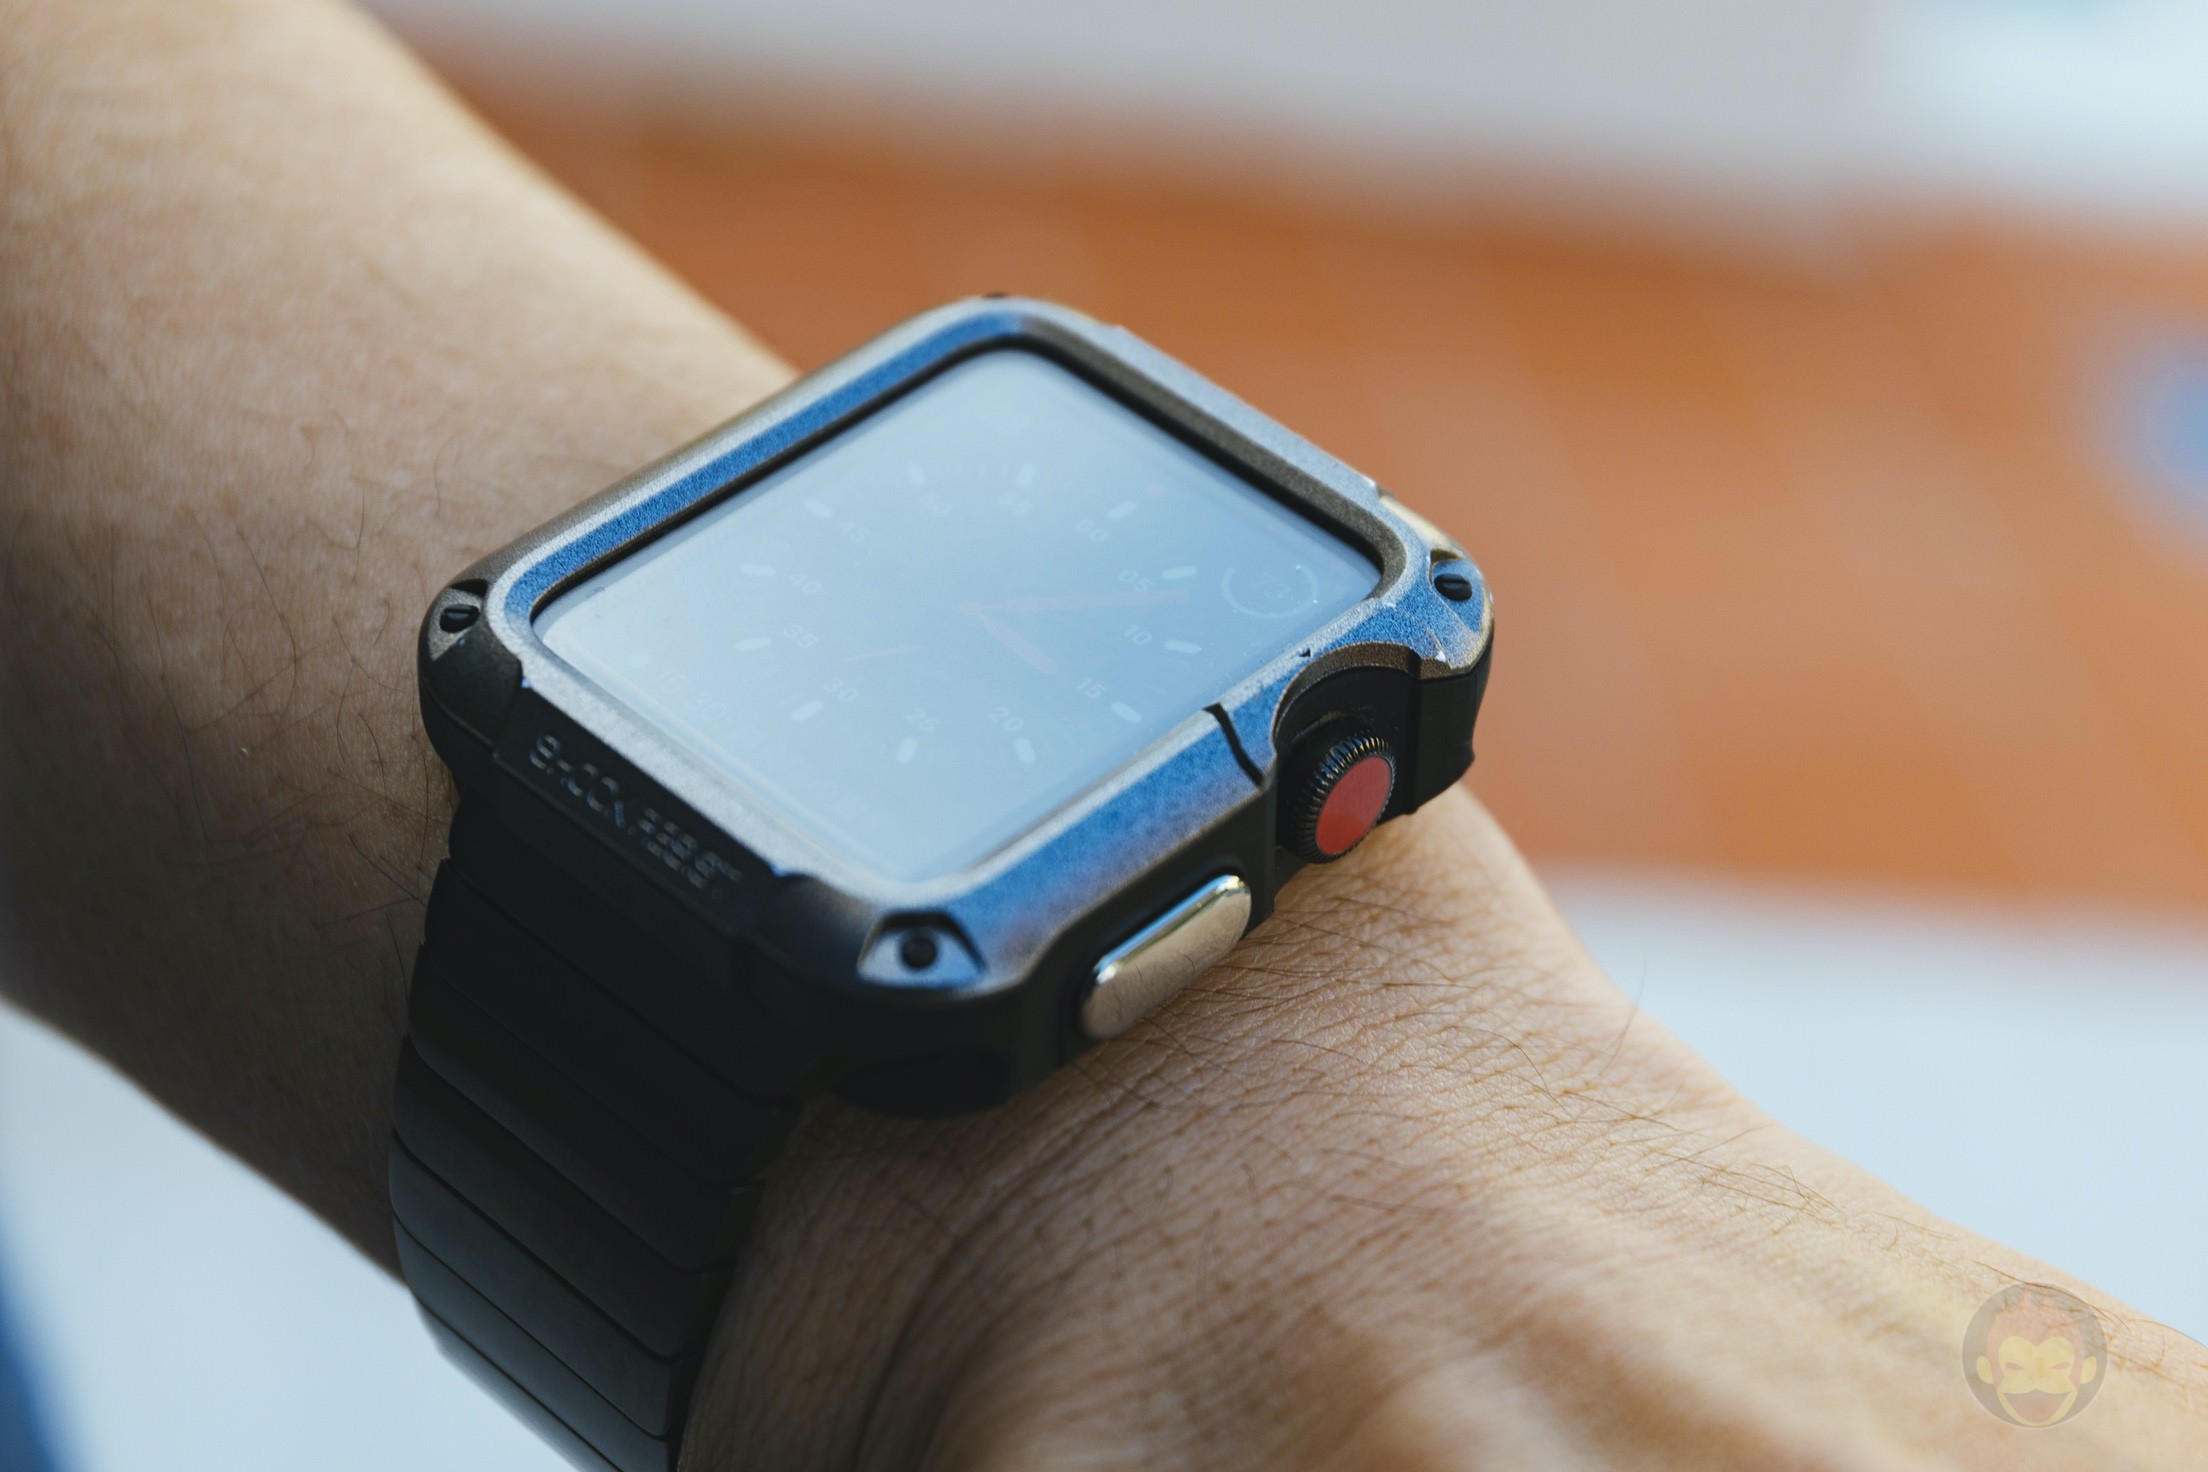 Apple-Watch-Series-3-LTE-Review-01.jpg